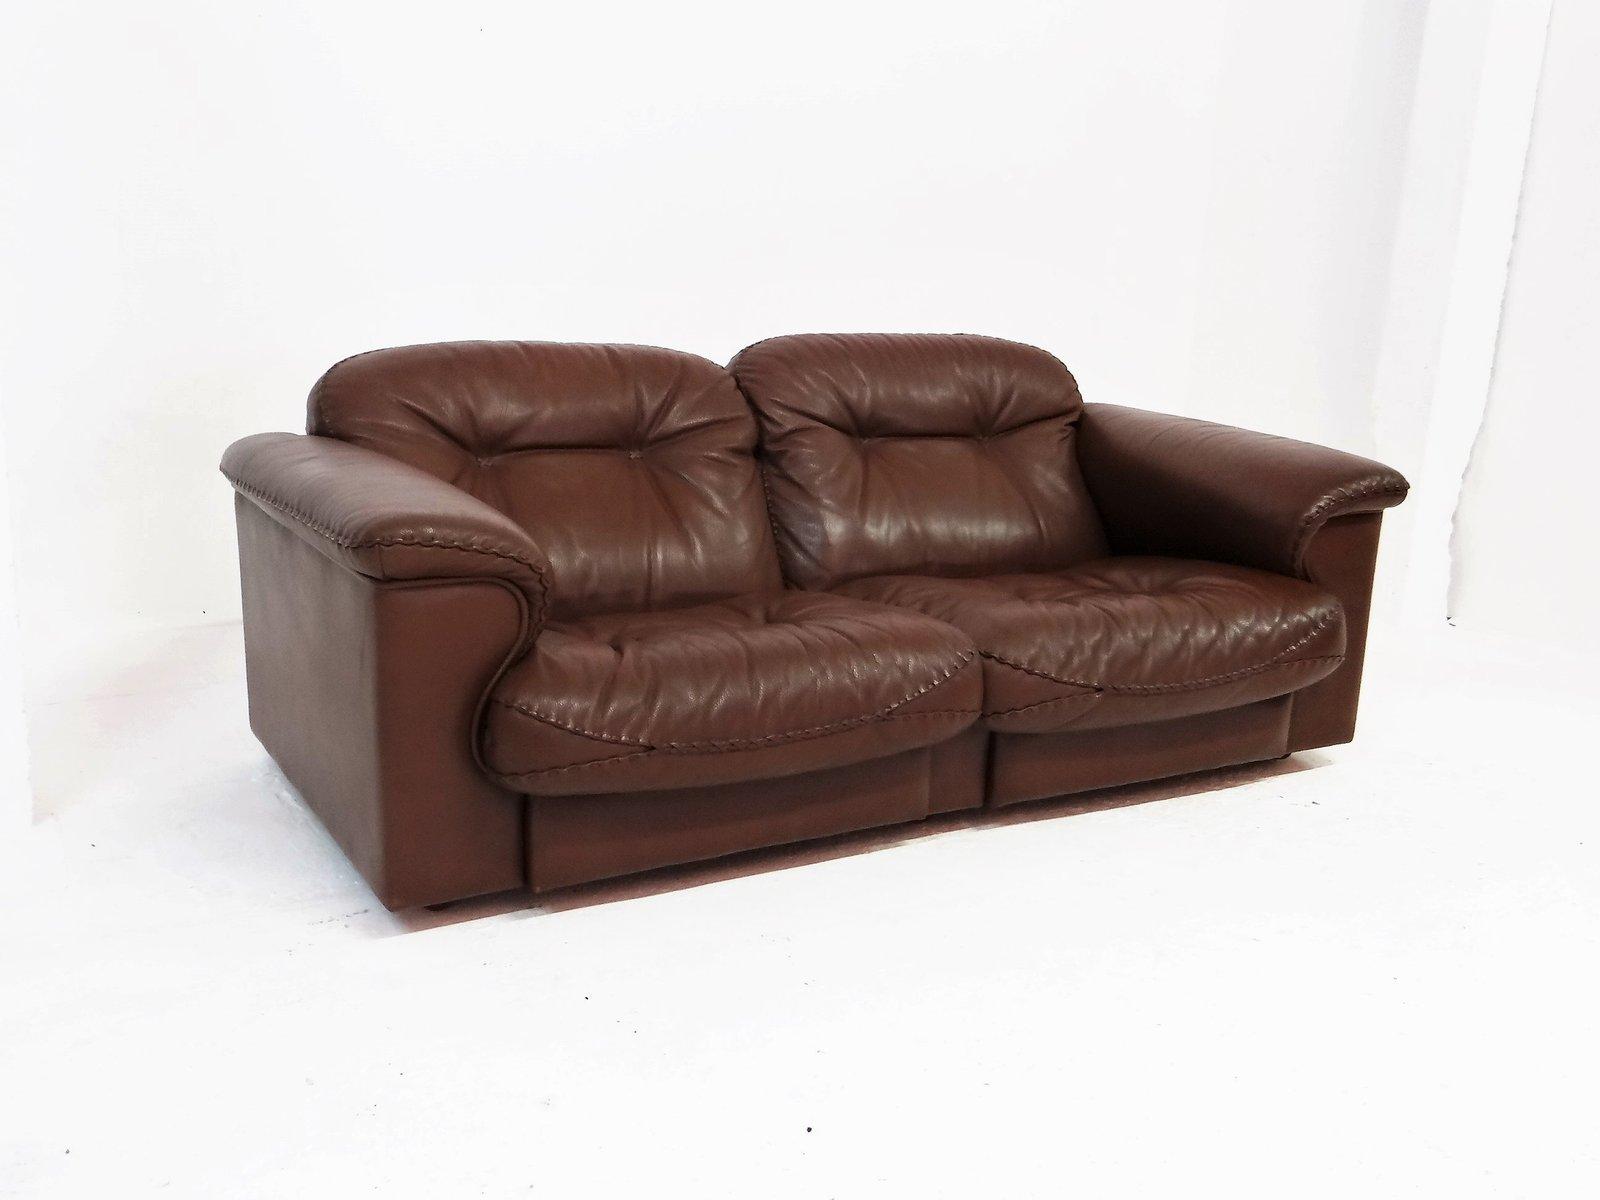 vintage ds 101 ledersofa von de sede bei pamono kaufen. Black Bedroom Furniture Sets. Home Design Ideas